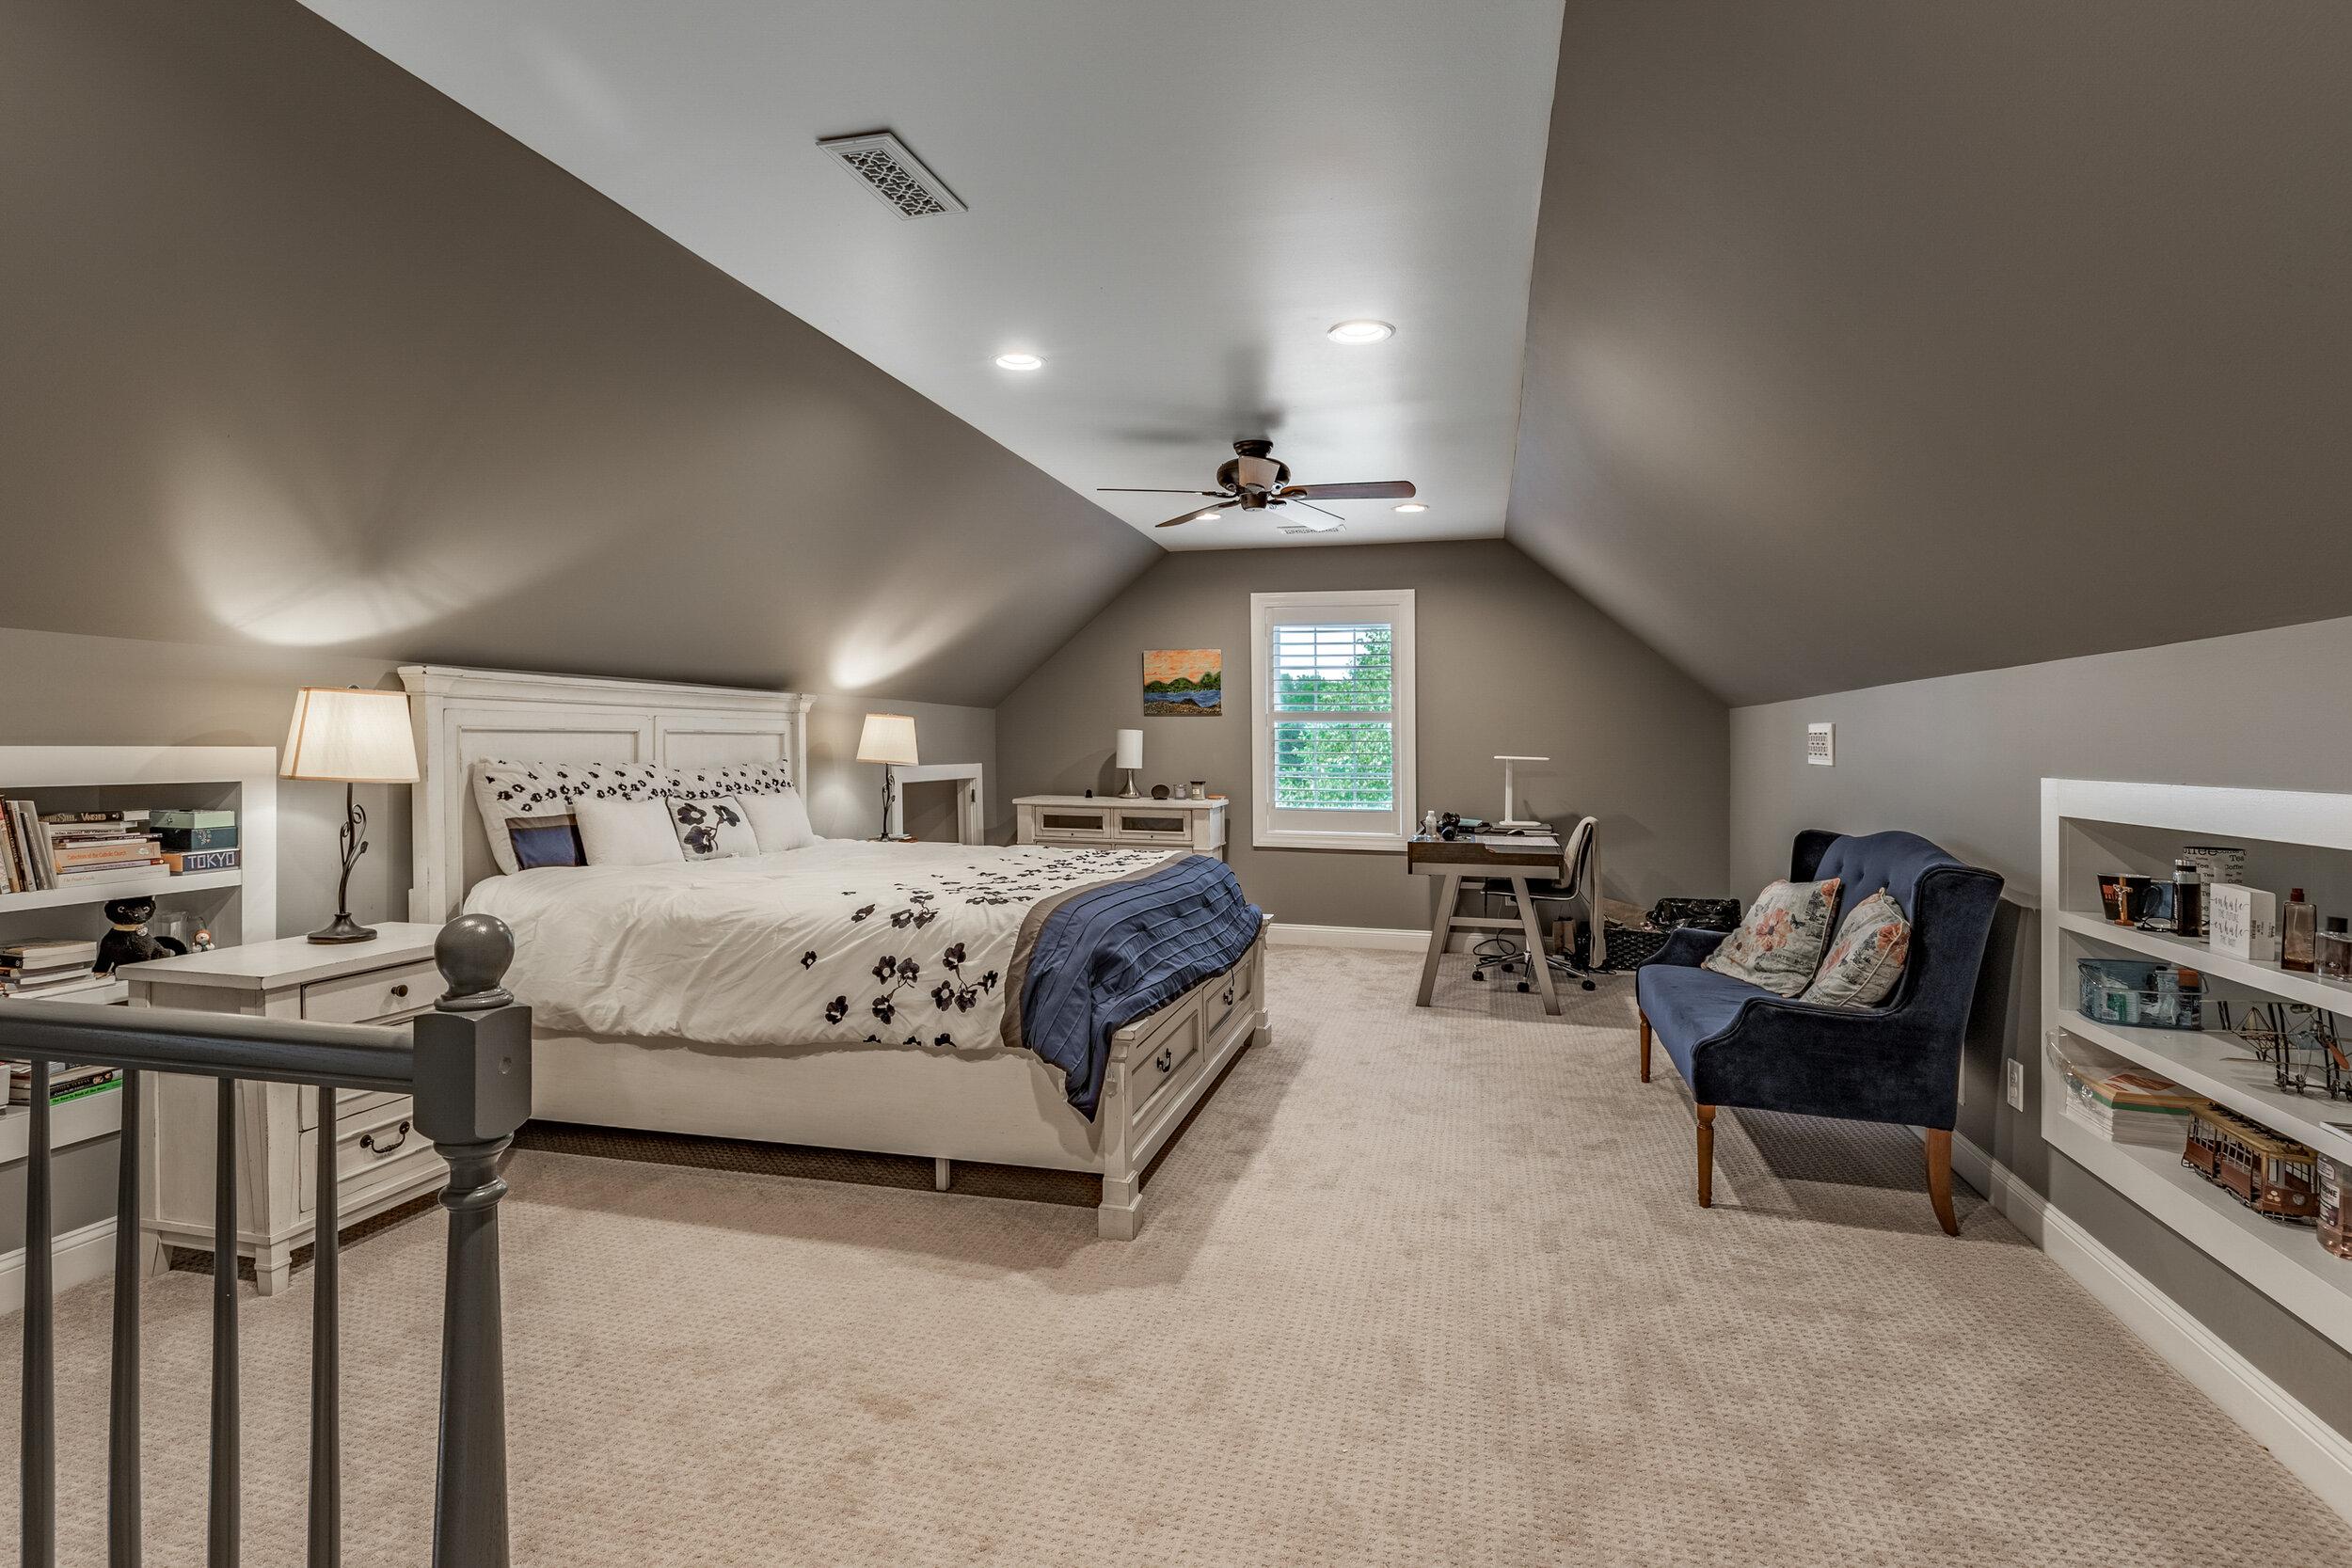 25_Bedroom-9.jpg